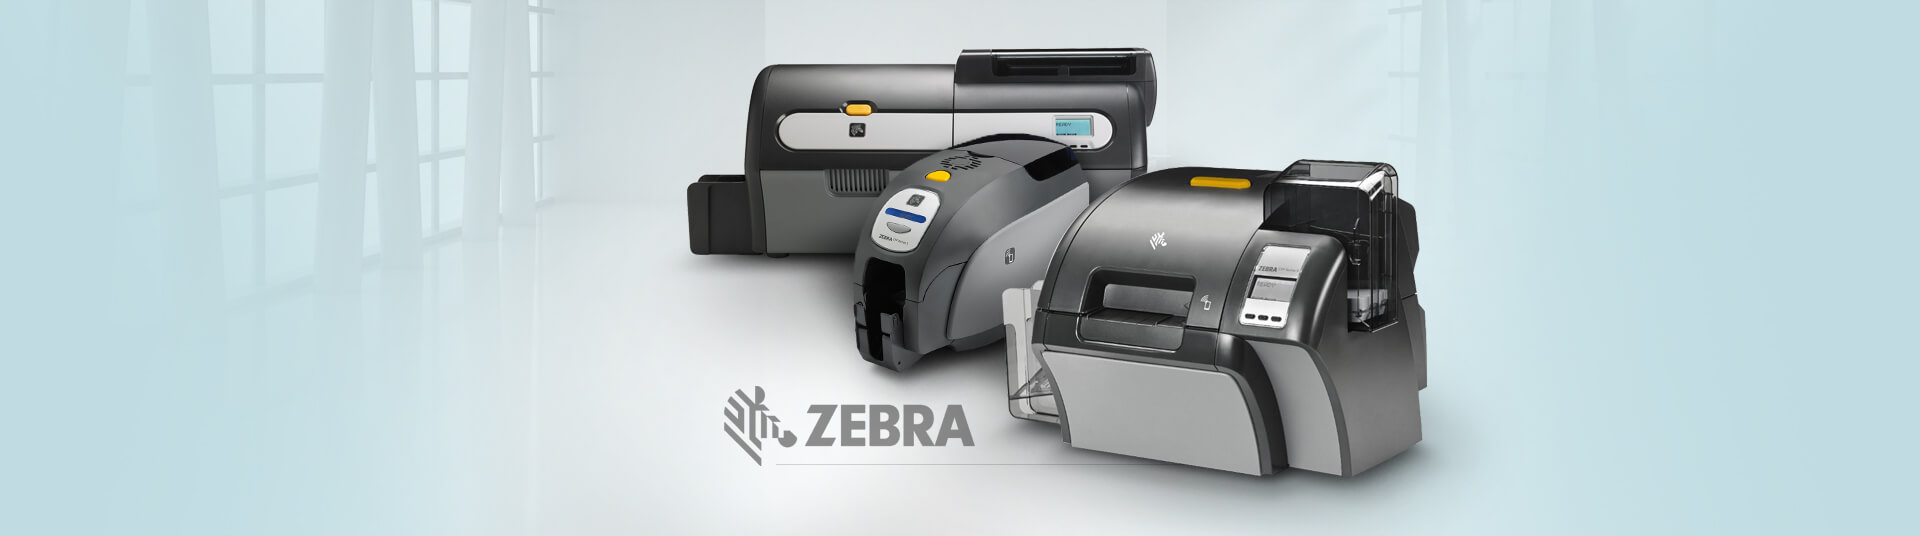 Zebra Photo ID Printers